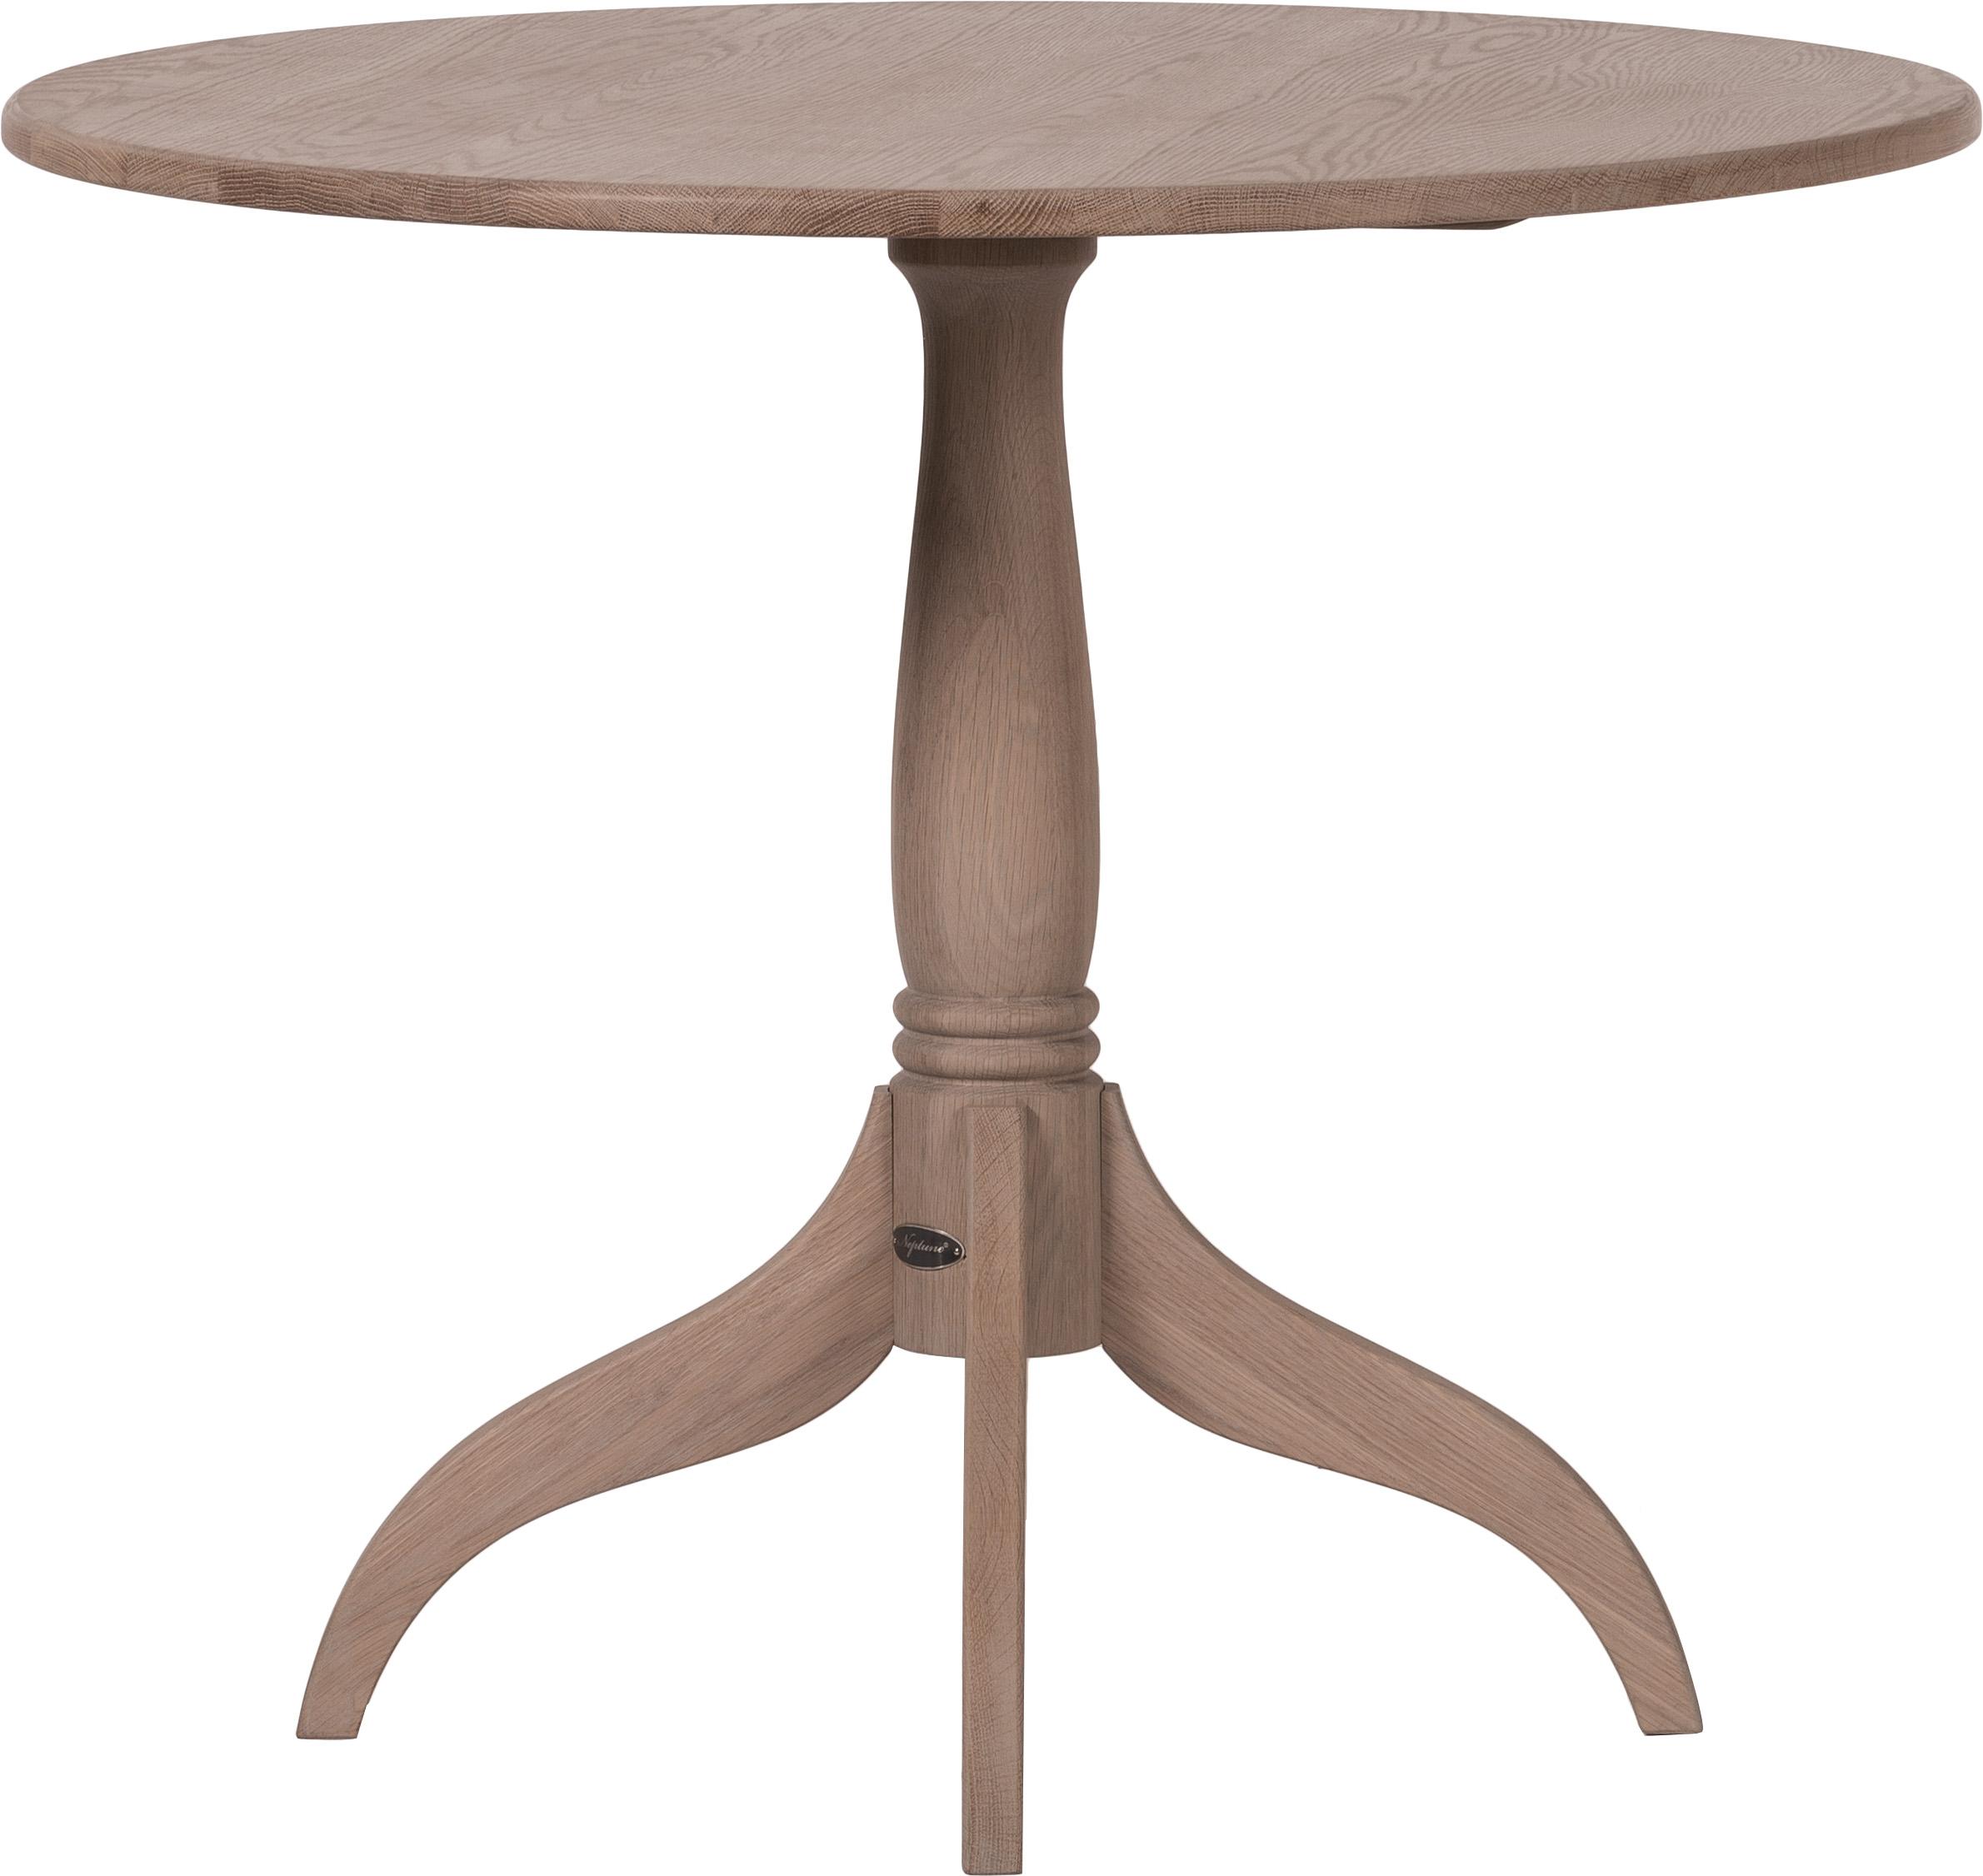 Sheldrake 4 Seater Dining Table